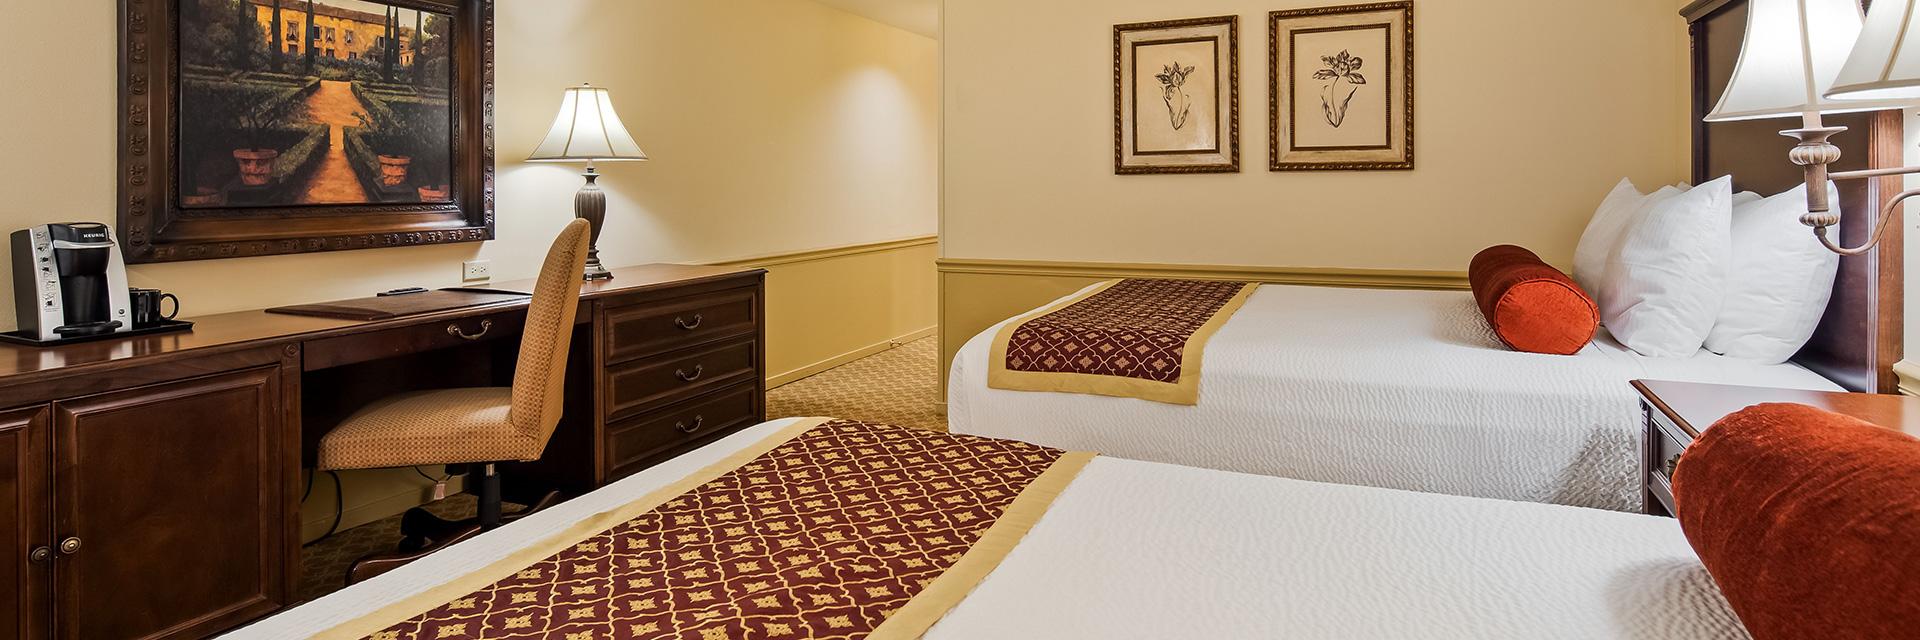 Rooms at Hotel Victorian Inn Monterey